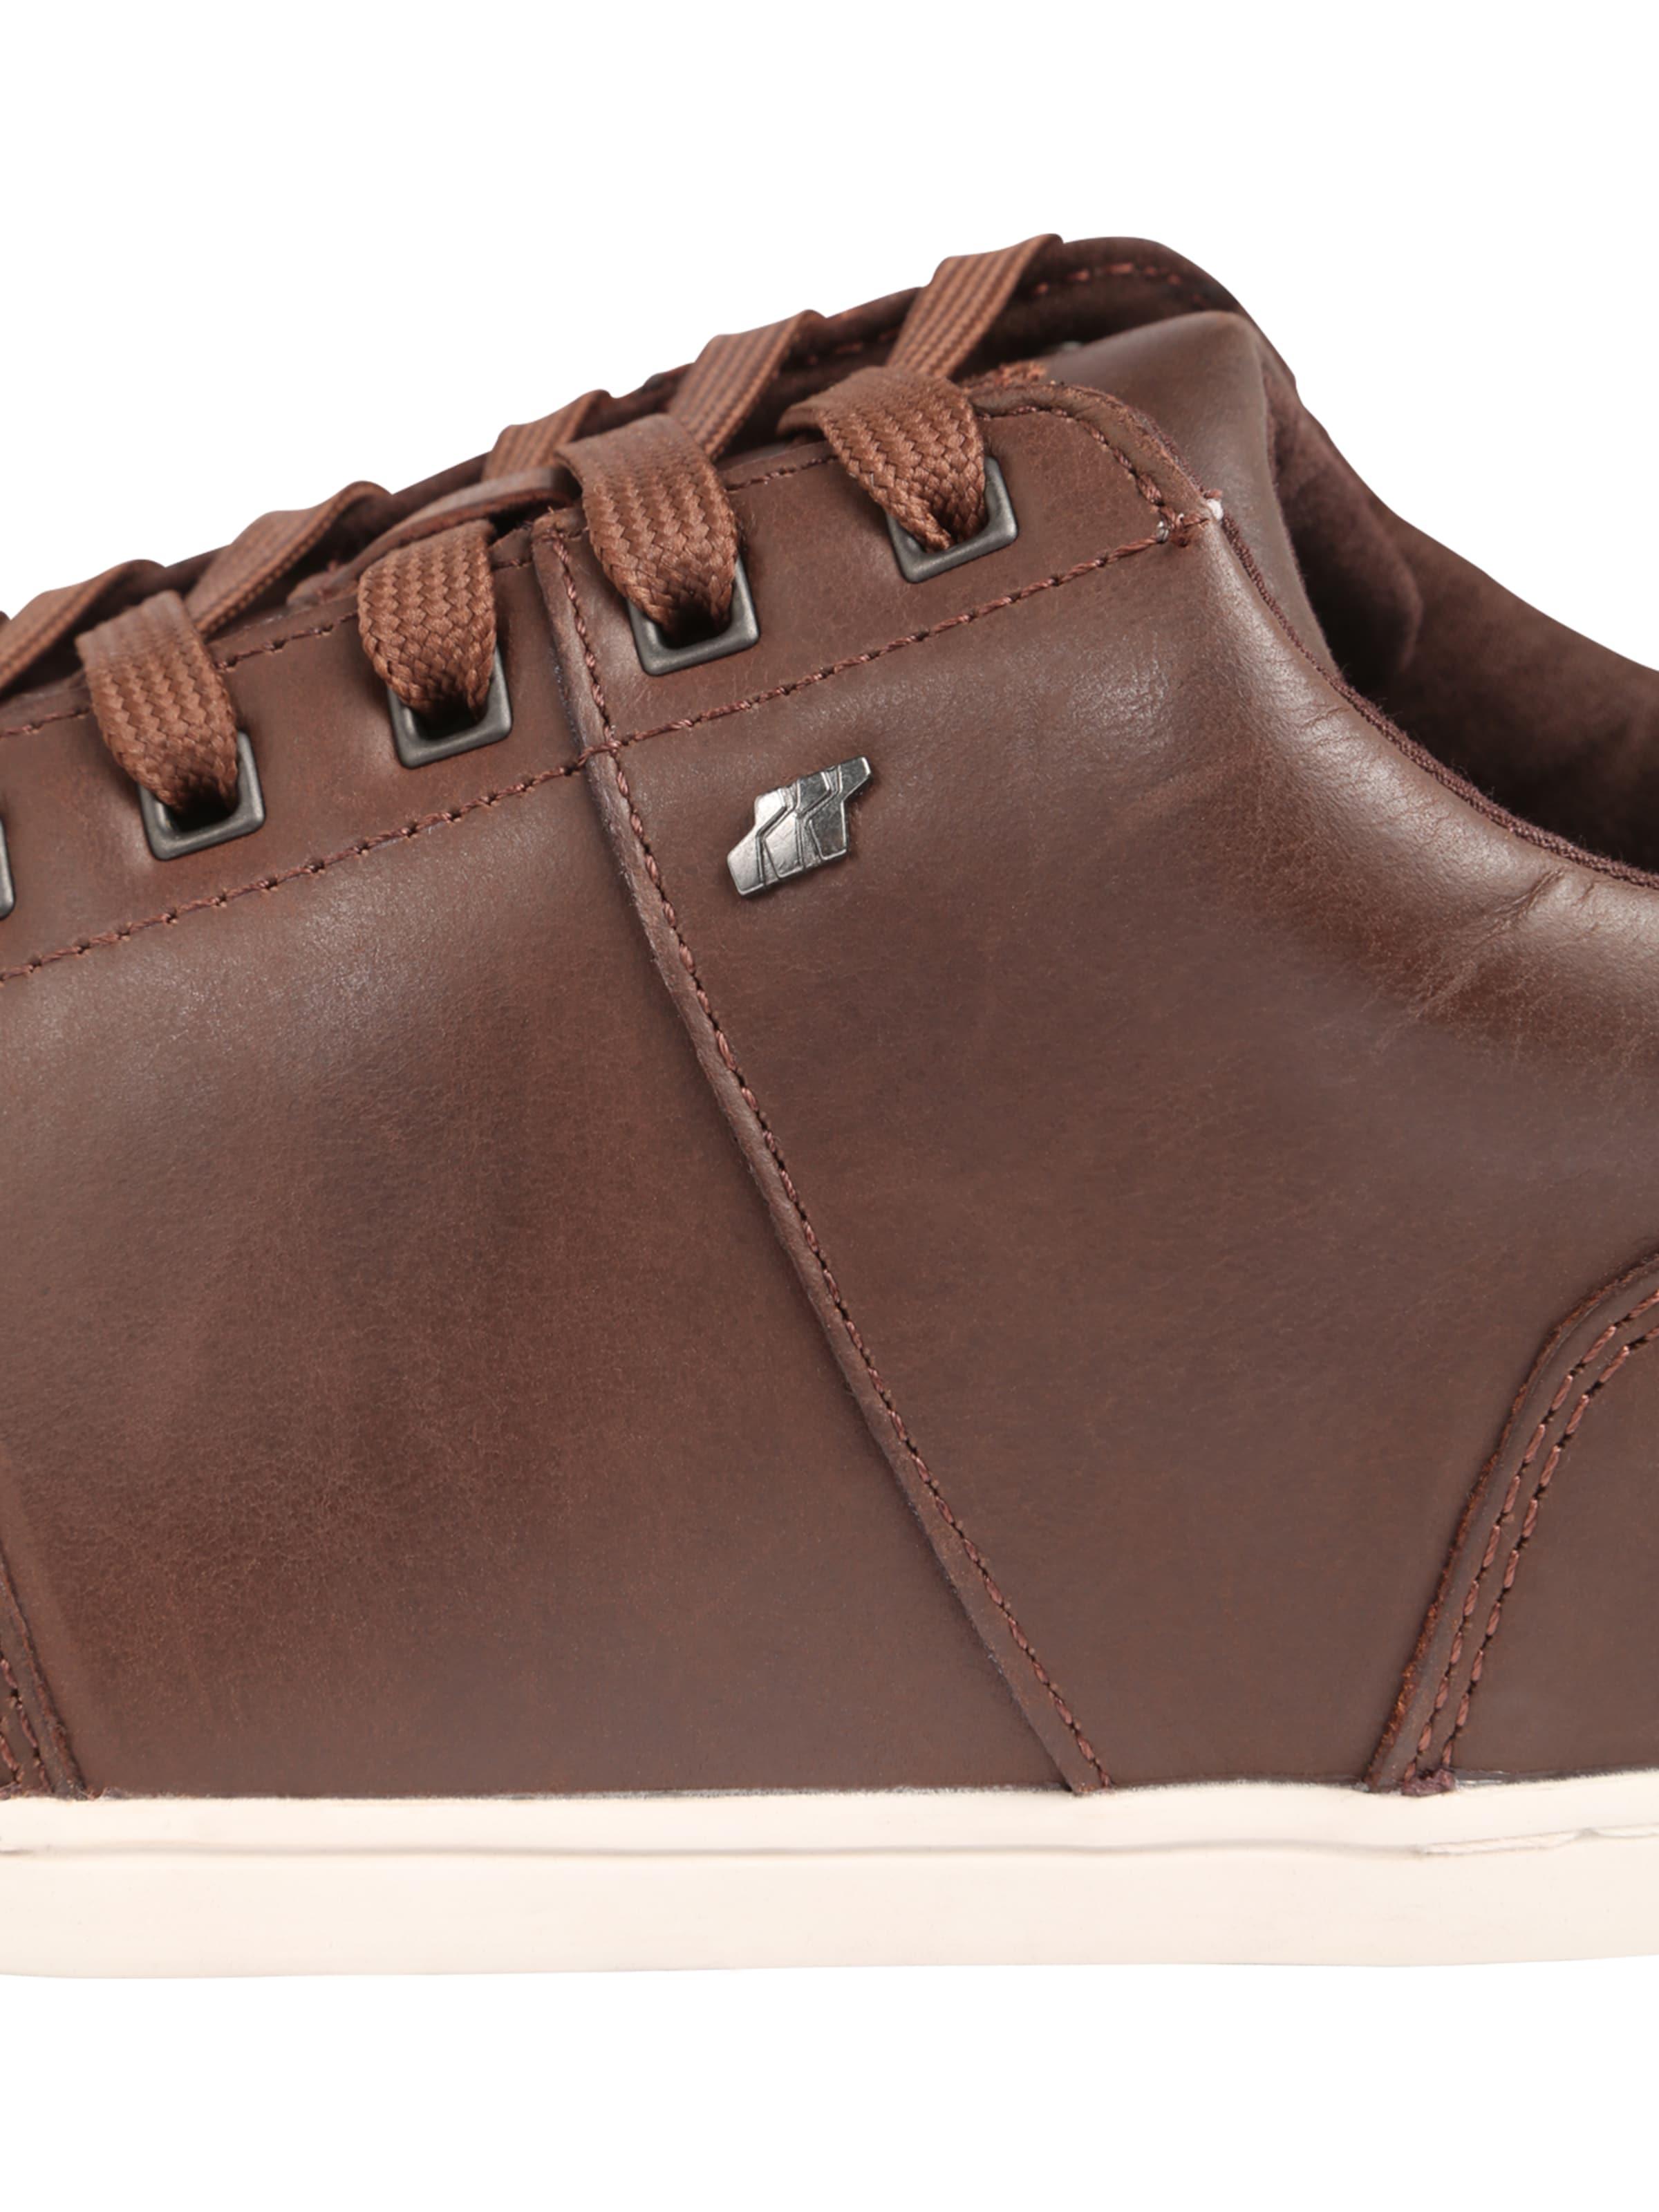 Sneaker Sneaker 'spencer' Braun Boxfresh 'spencer' In Boxfresh WrdCoexB